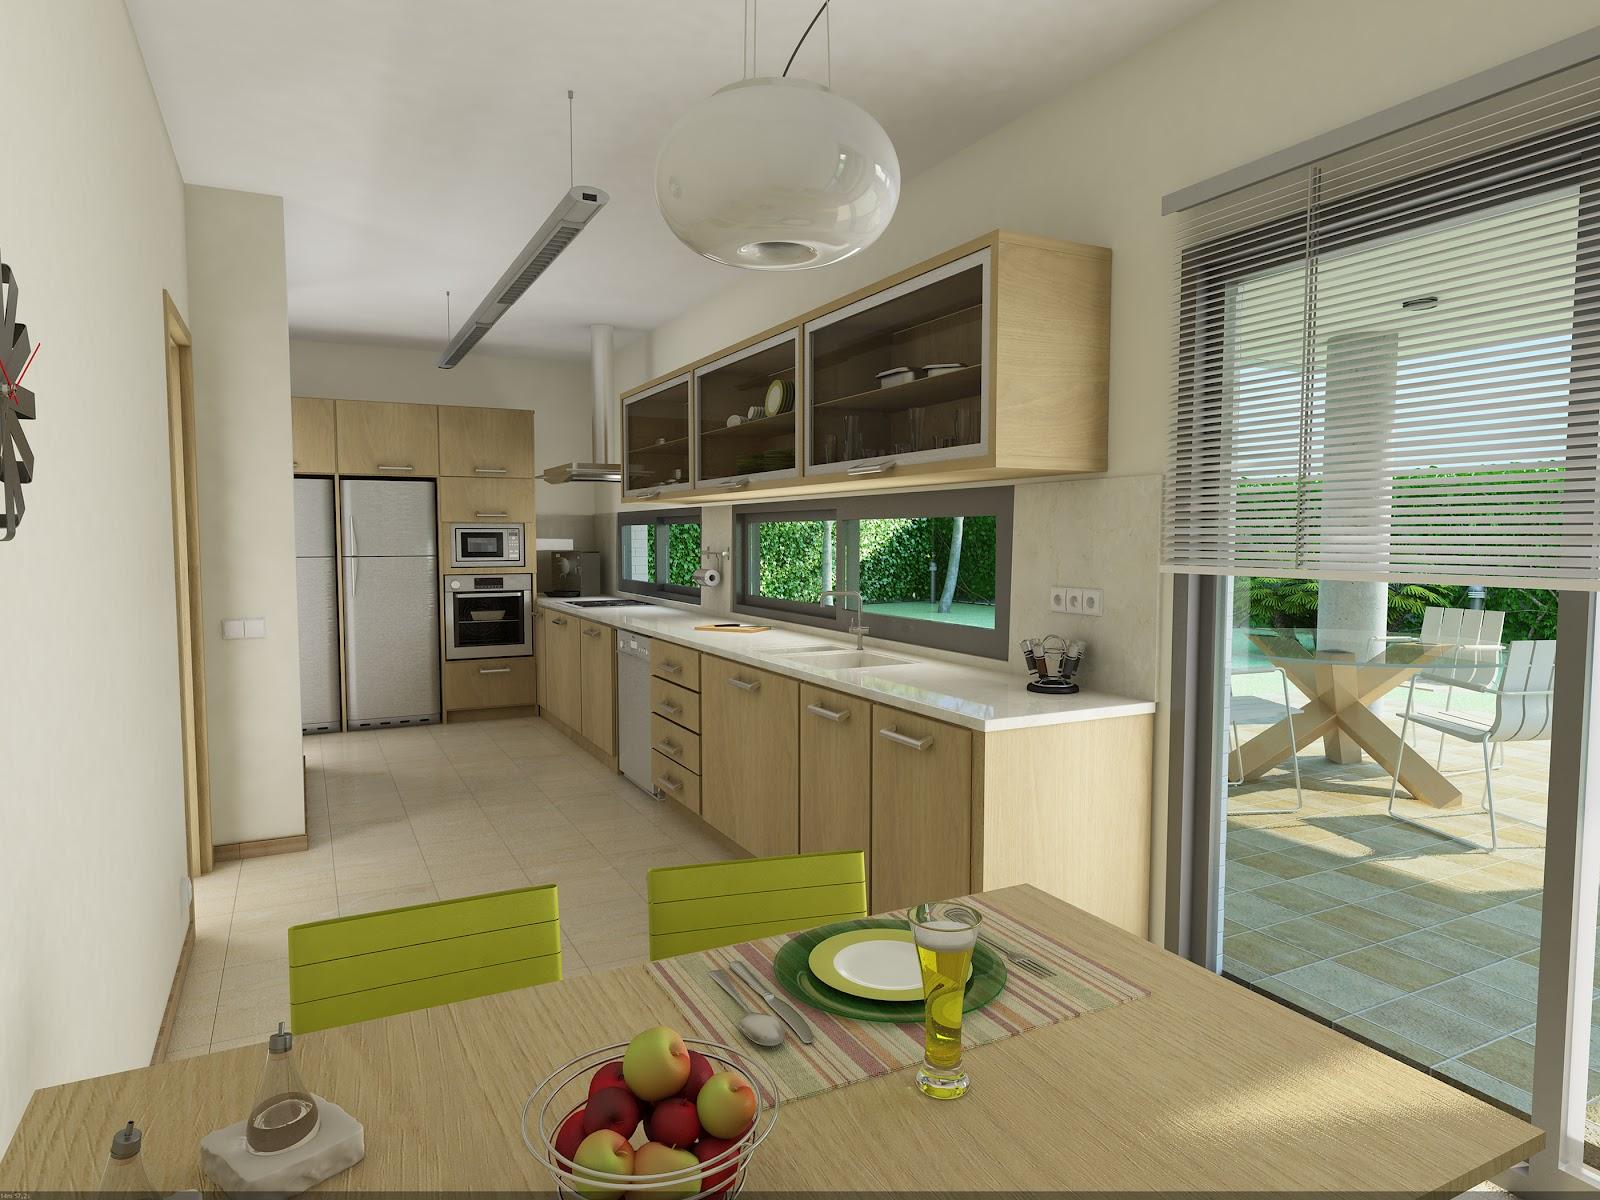 Curso online:Revit Architecture: 11.6. Familias: Cocinas II